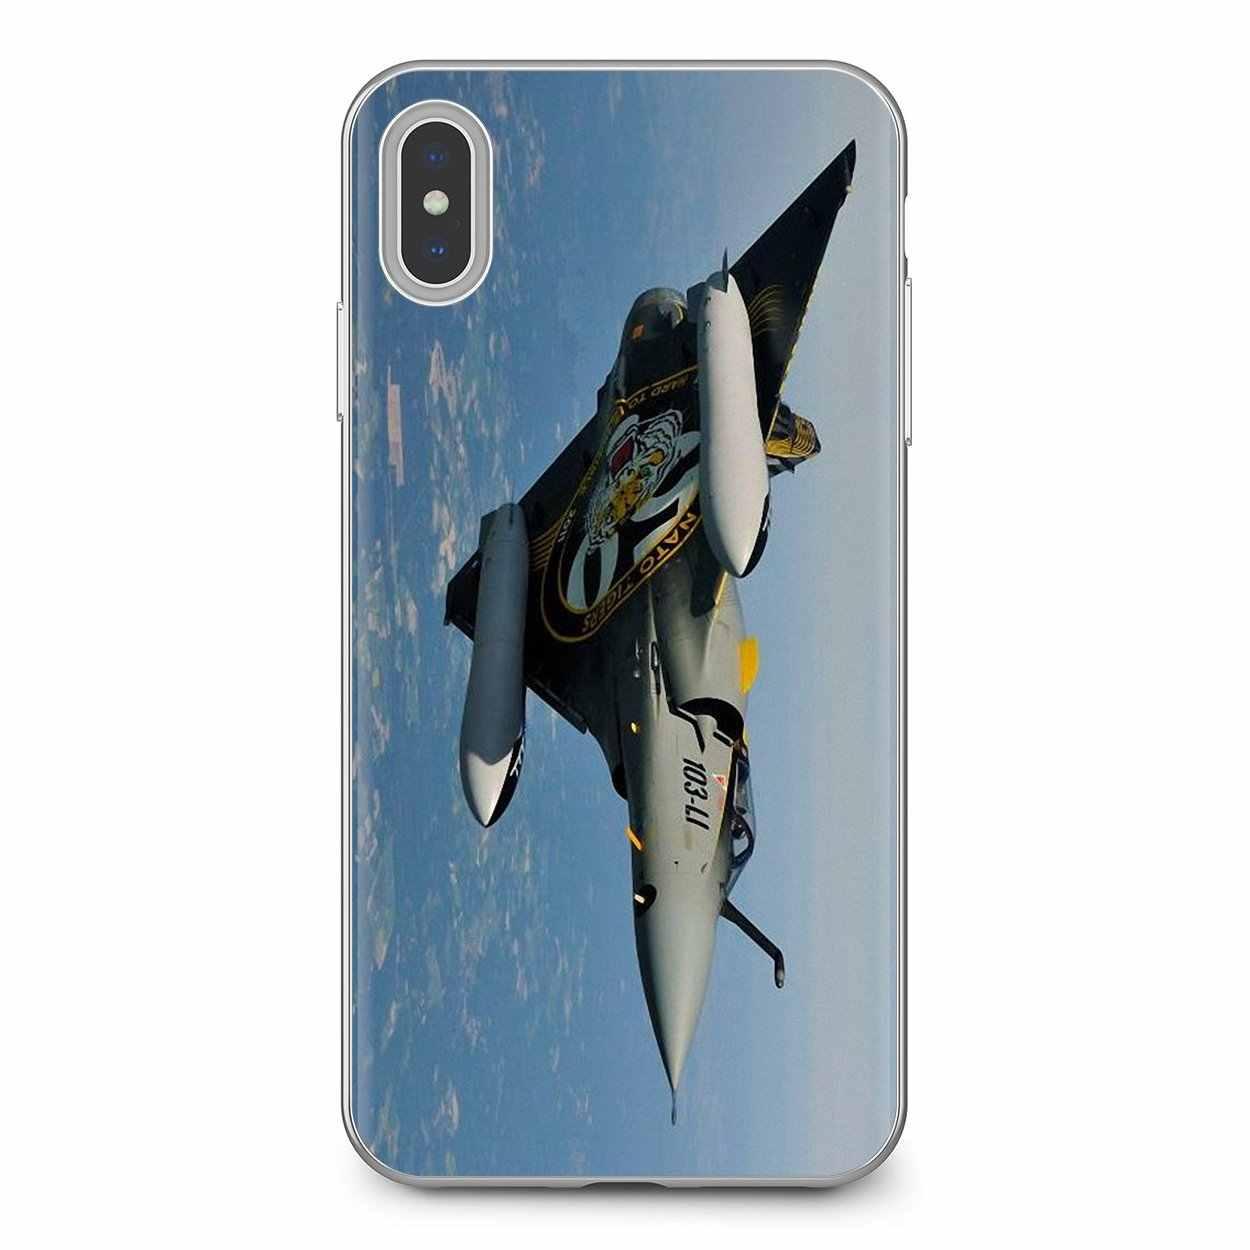 Xiaomi Redmi için 4A 7A S2 not 8 3 3S 4 4X5 artı 6 7 6A Pro pocophone F1 Mirage 2000 uçak hava kuvvetleri yumuşak çanta durumda